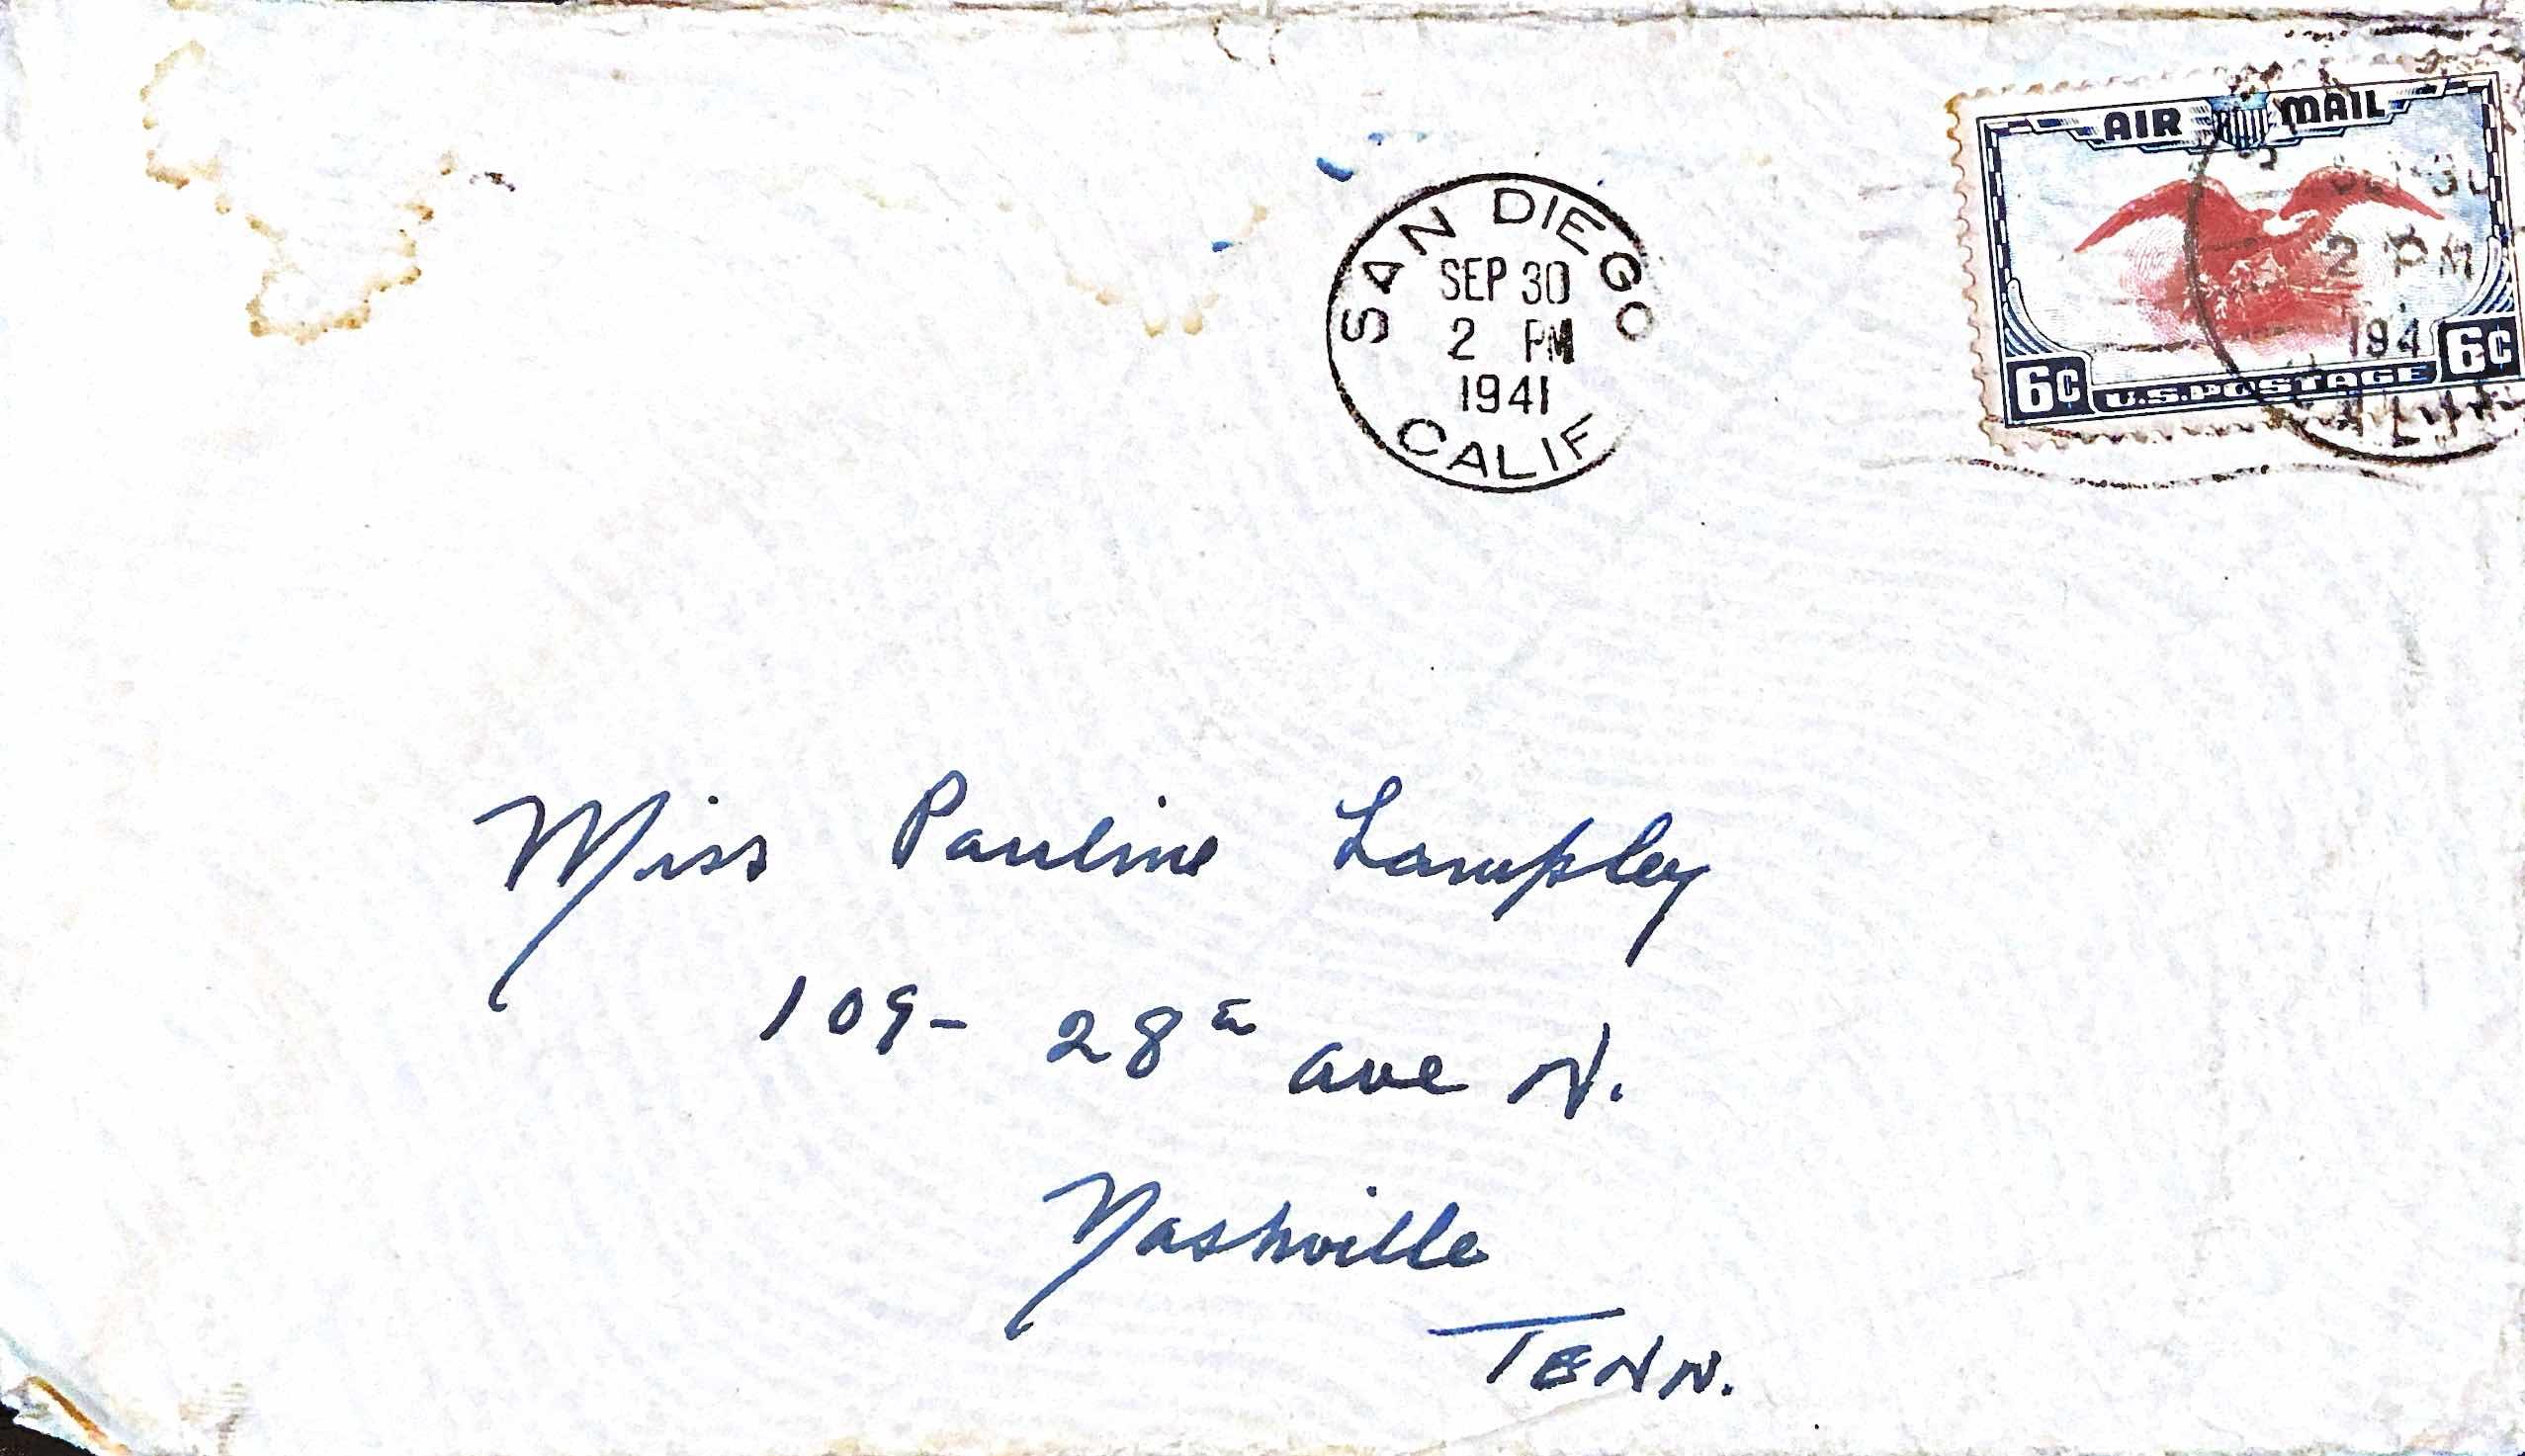 September, 29 1941 Dear Pauline